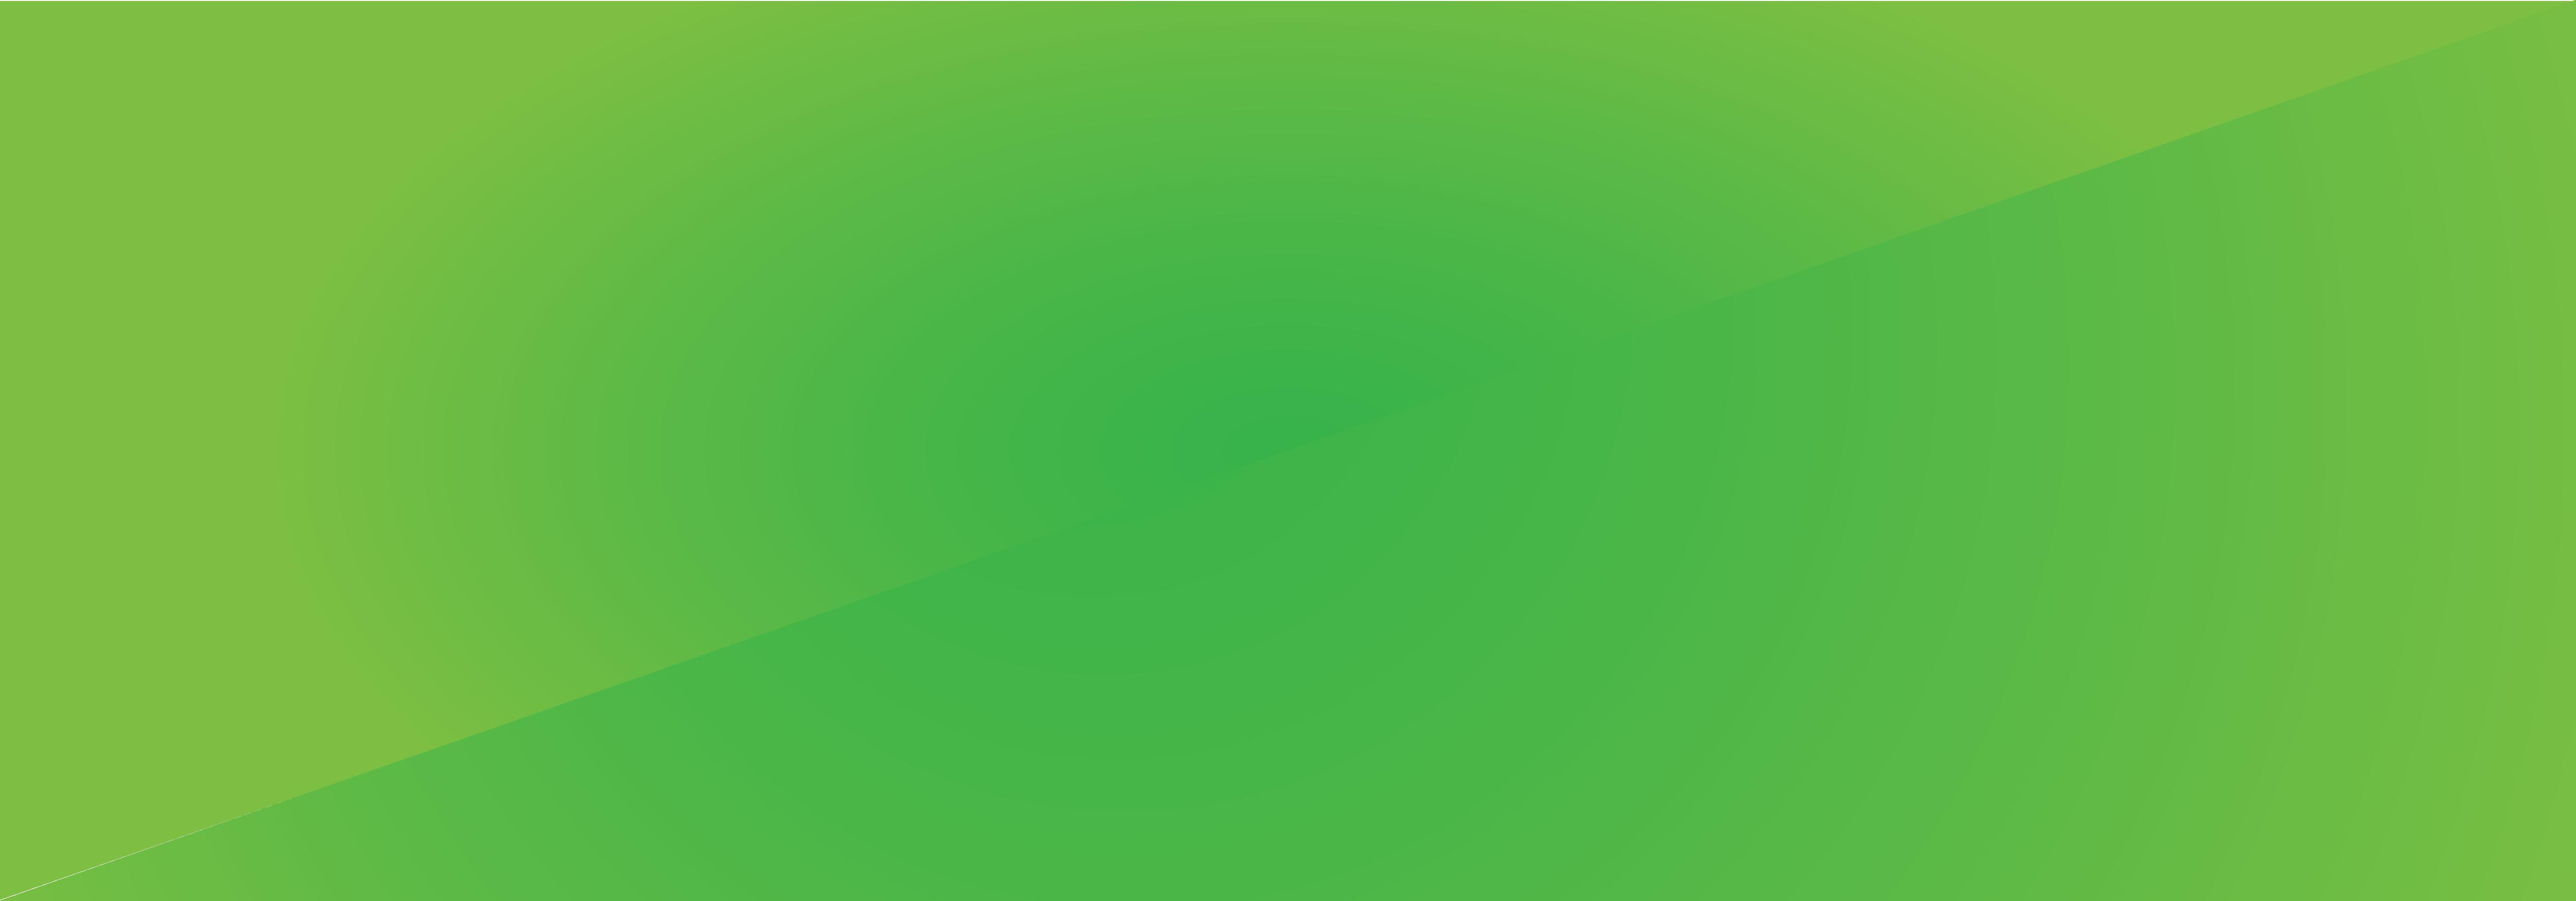 Green header background image